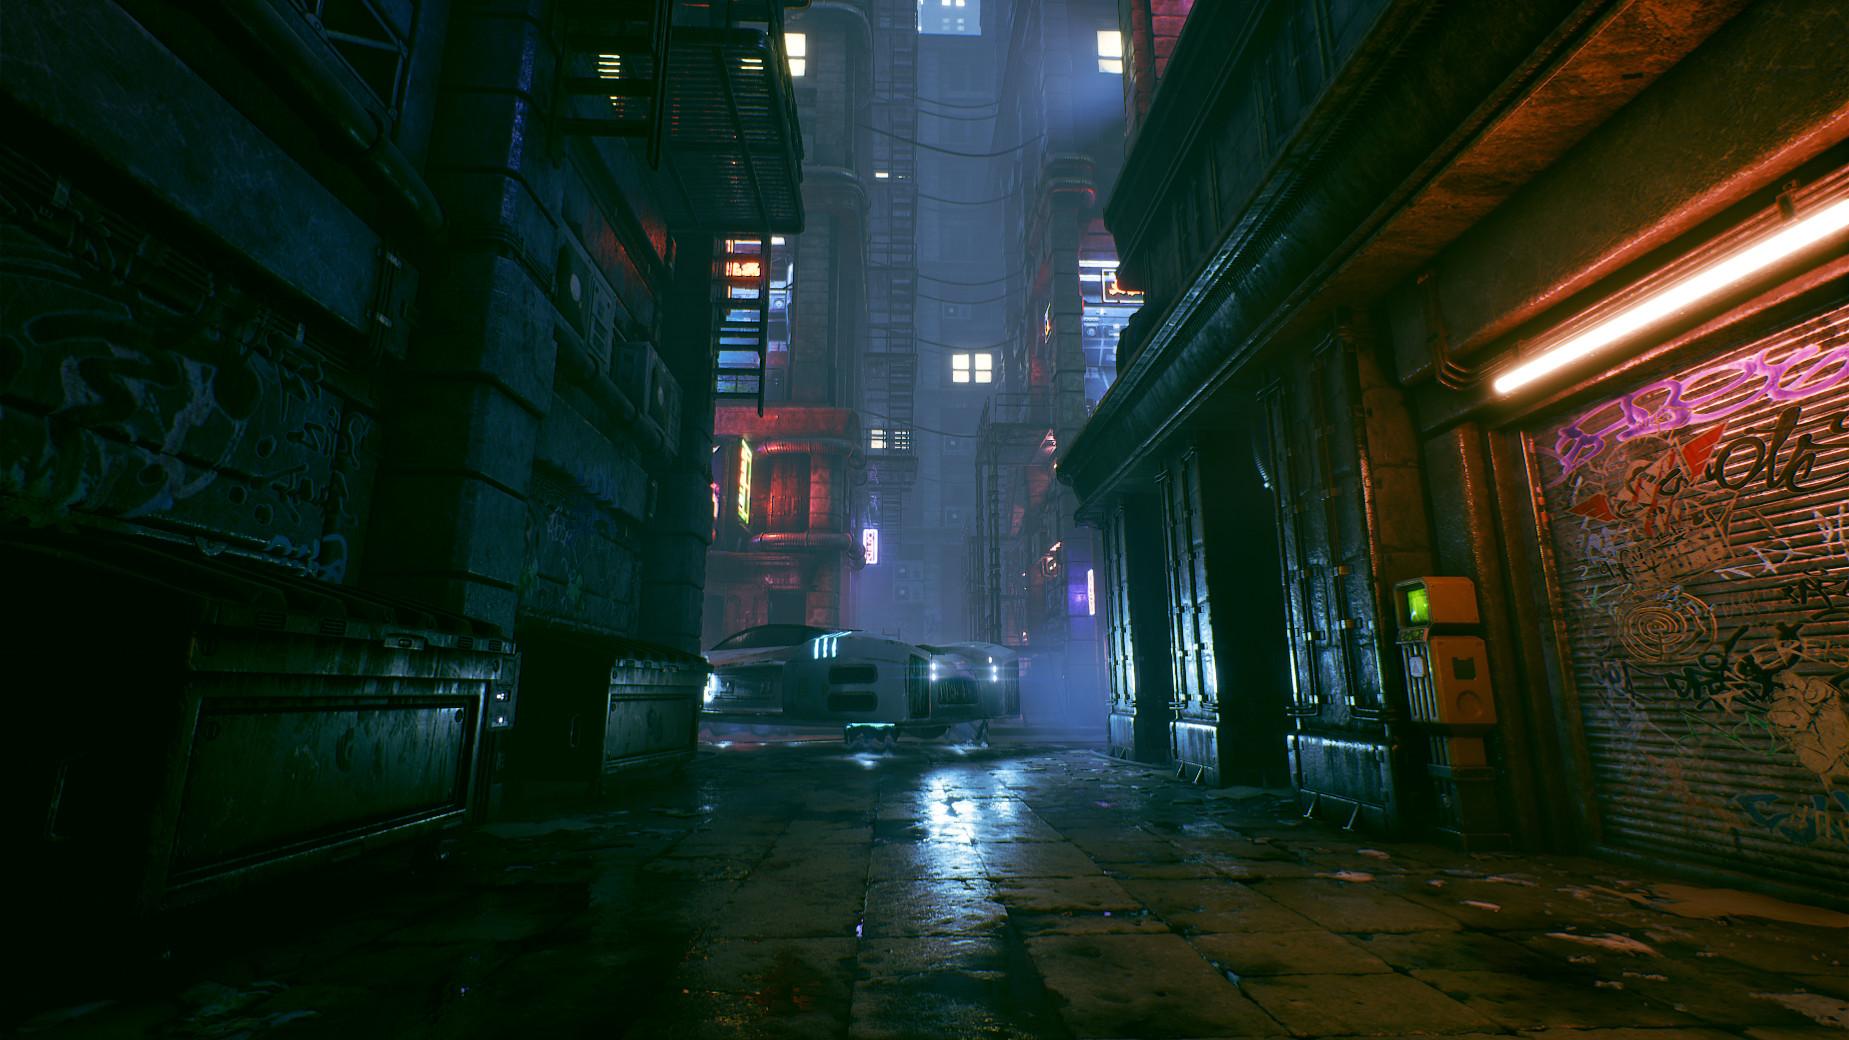 ArtStation - Cyberpunk City Alley - Unreal Engine 4, Michal Baca